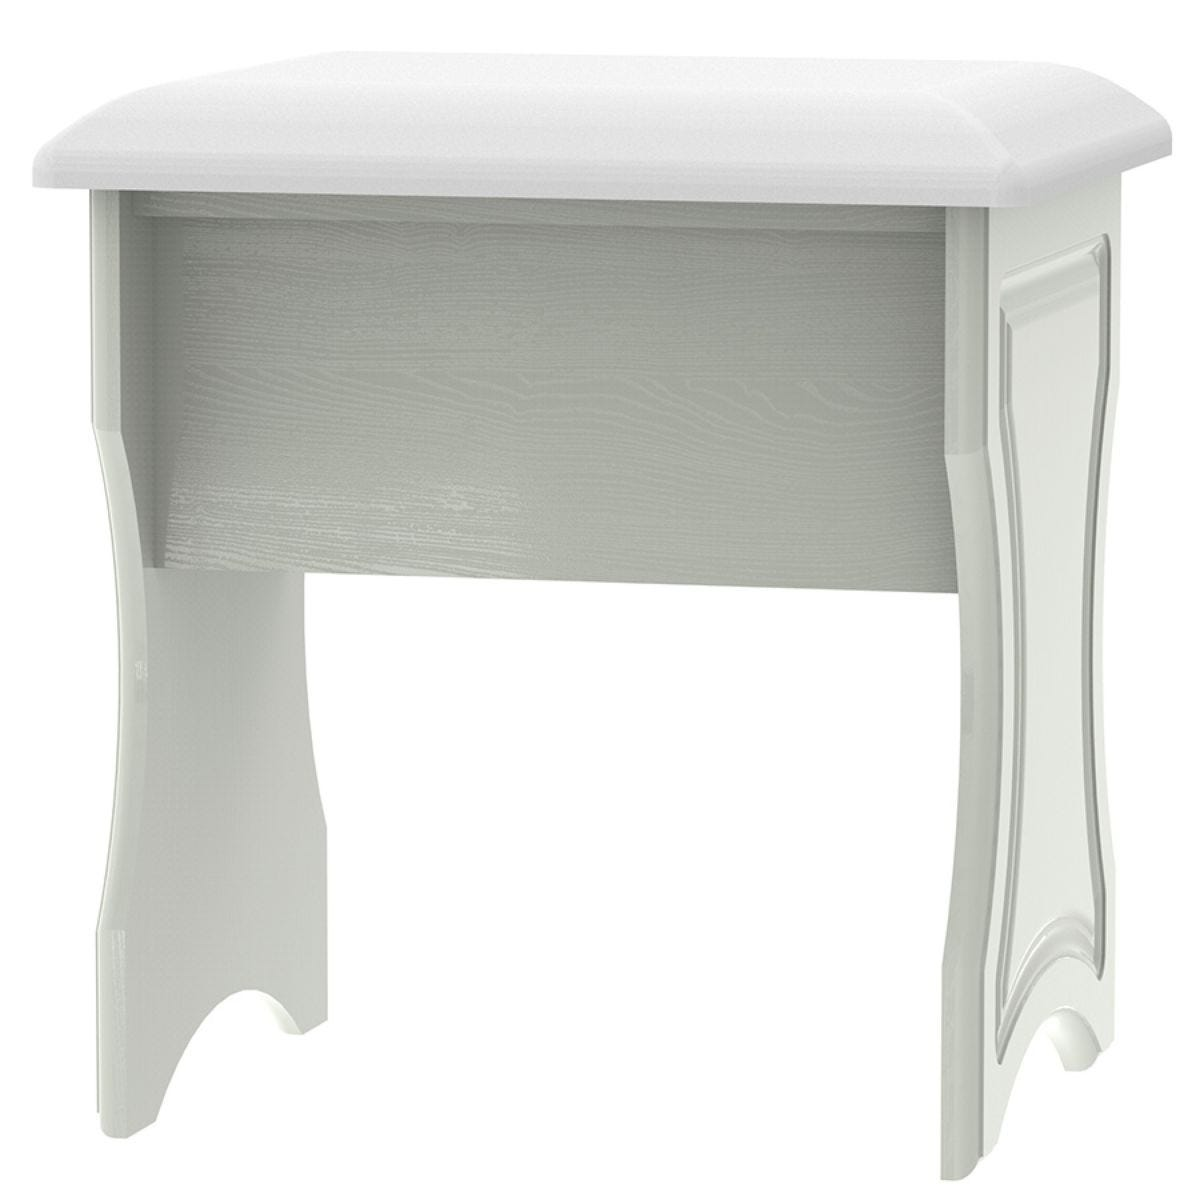 Montego Dressing Table Stool - Ash Grey